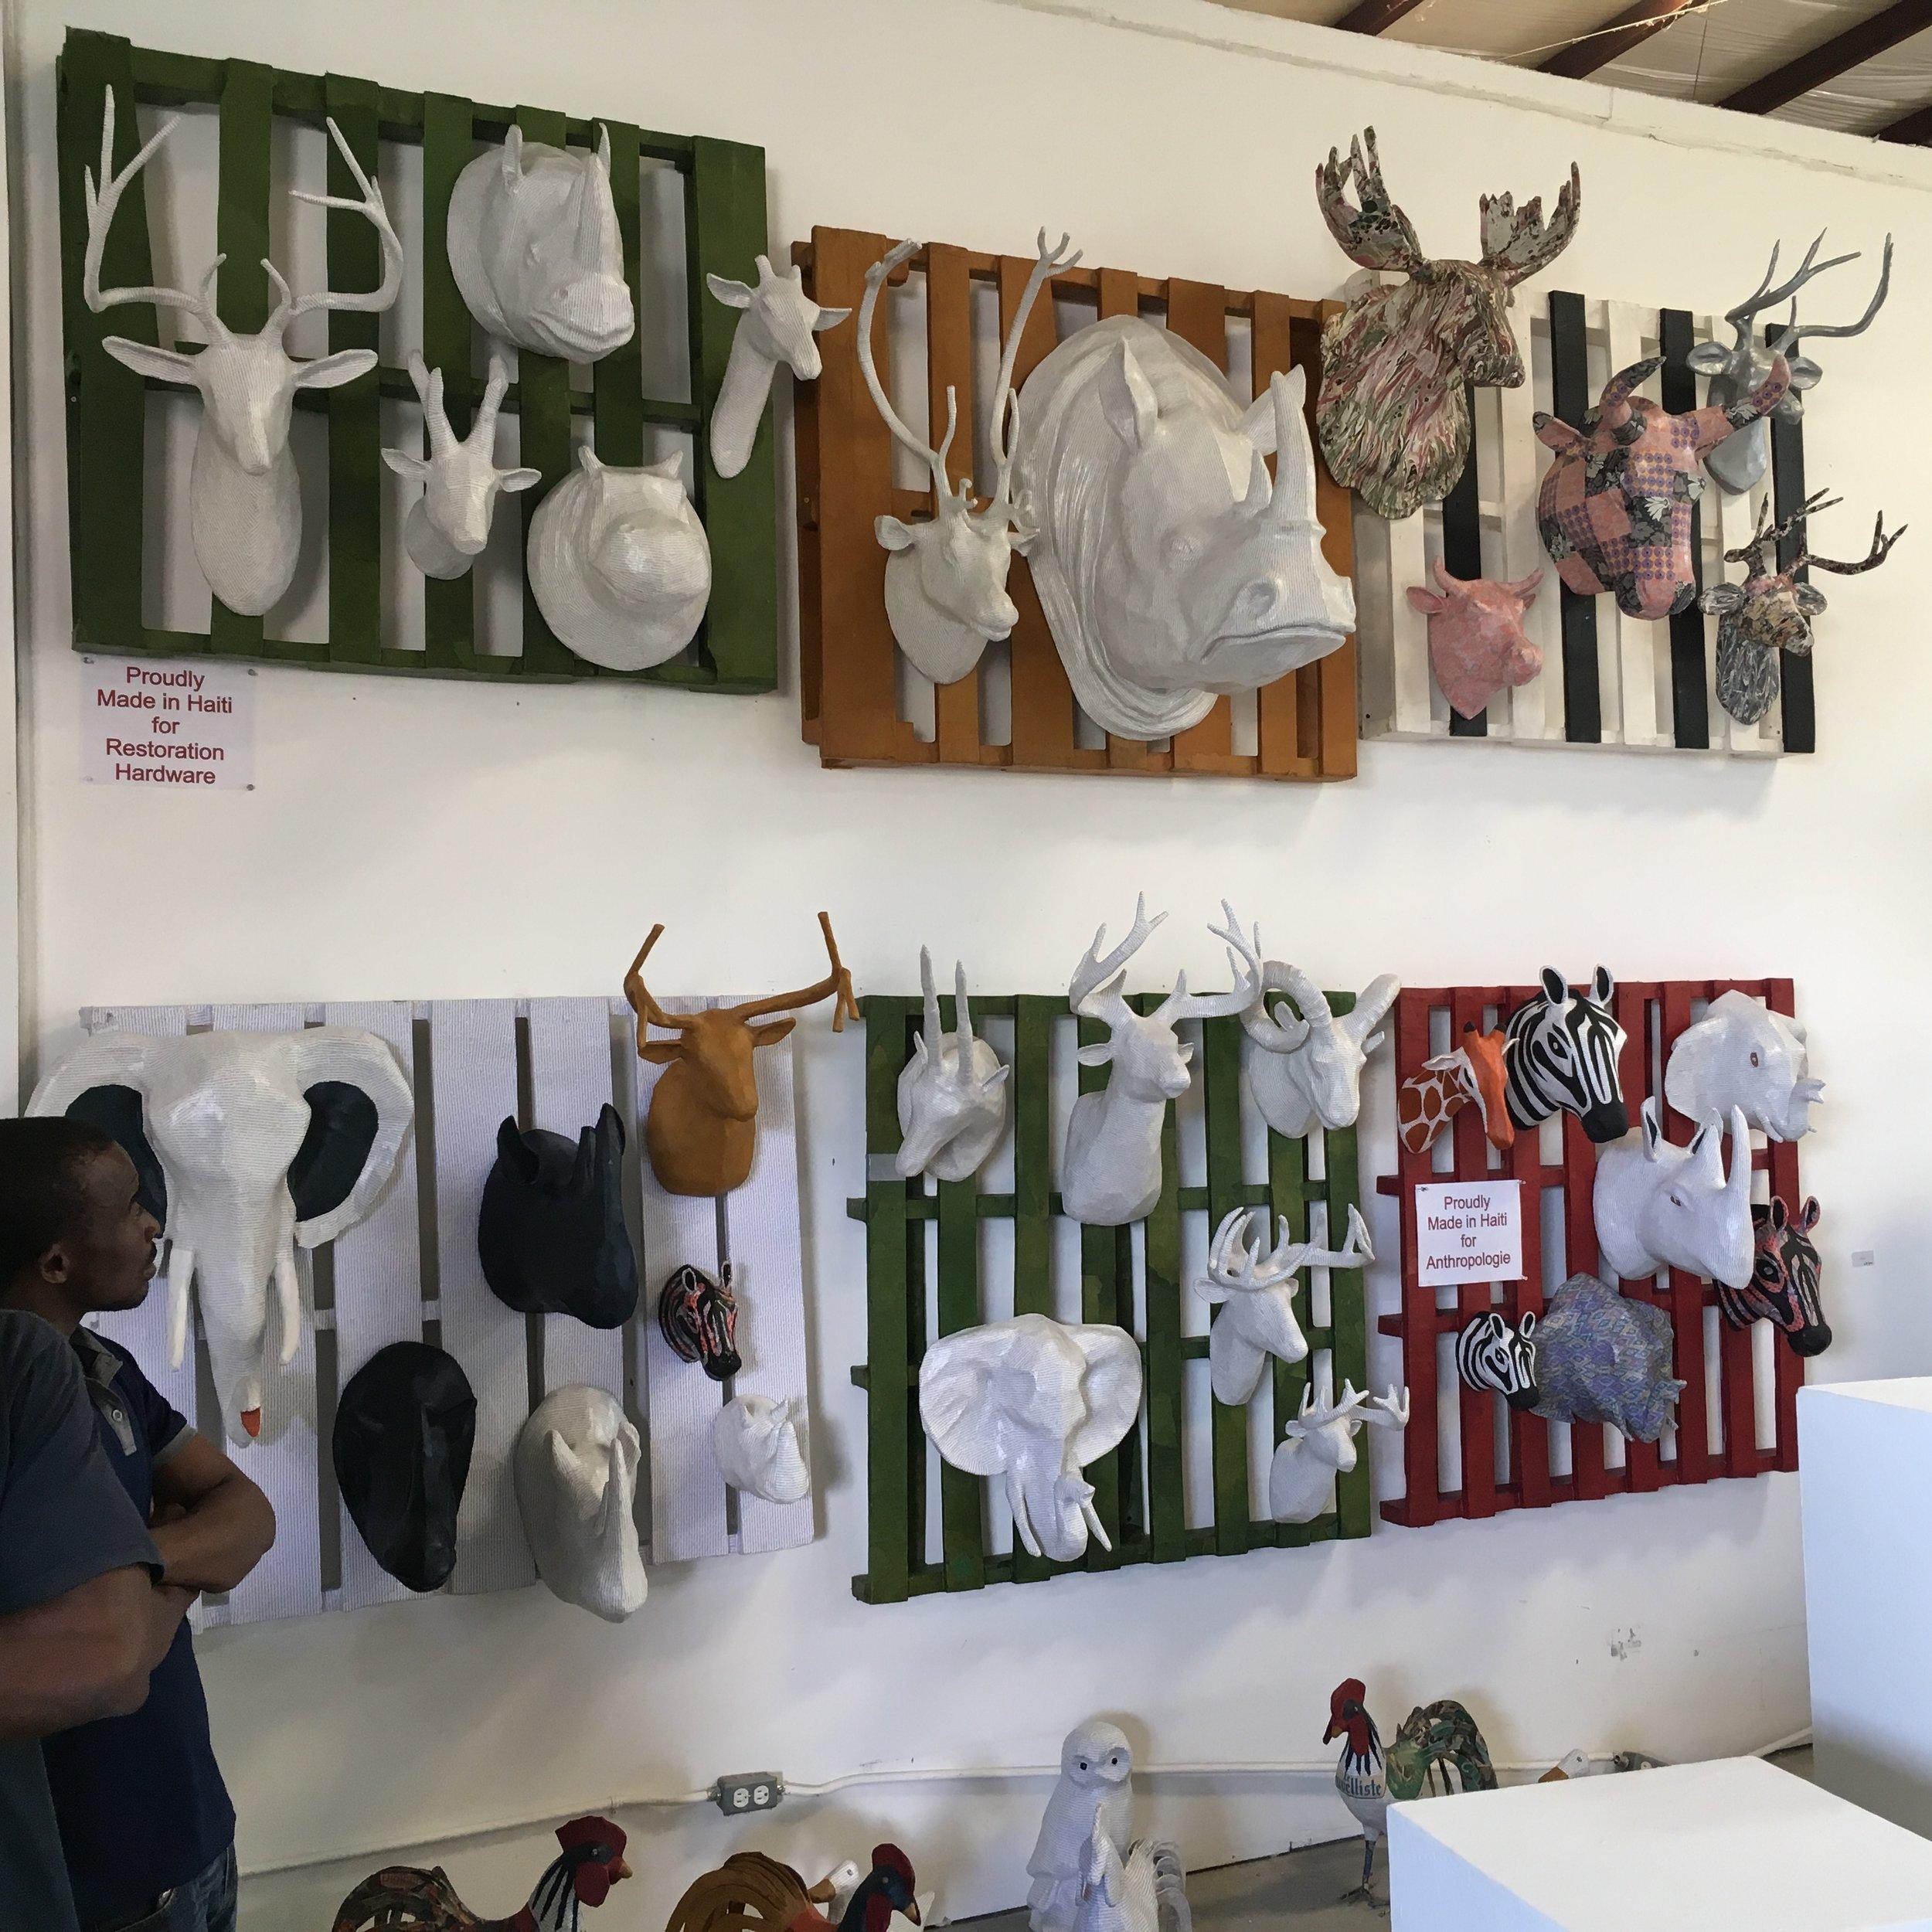 Paper mache exposition for the visit of Conan O'Brien in Haiti